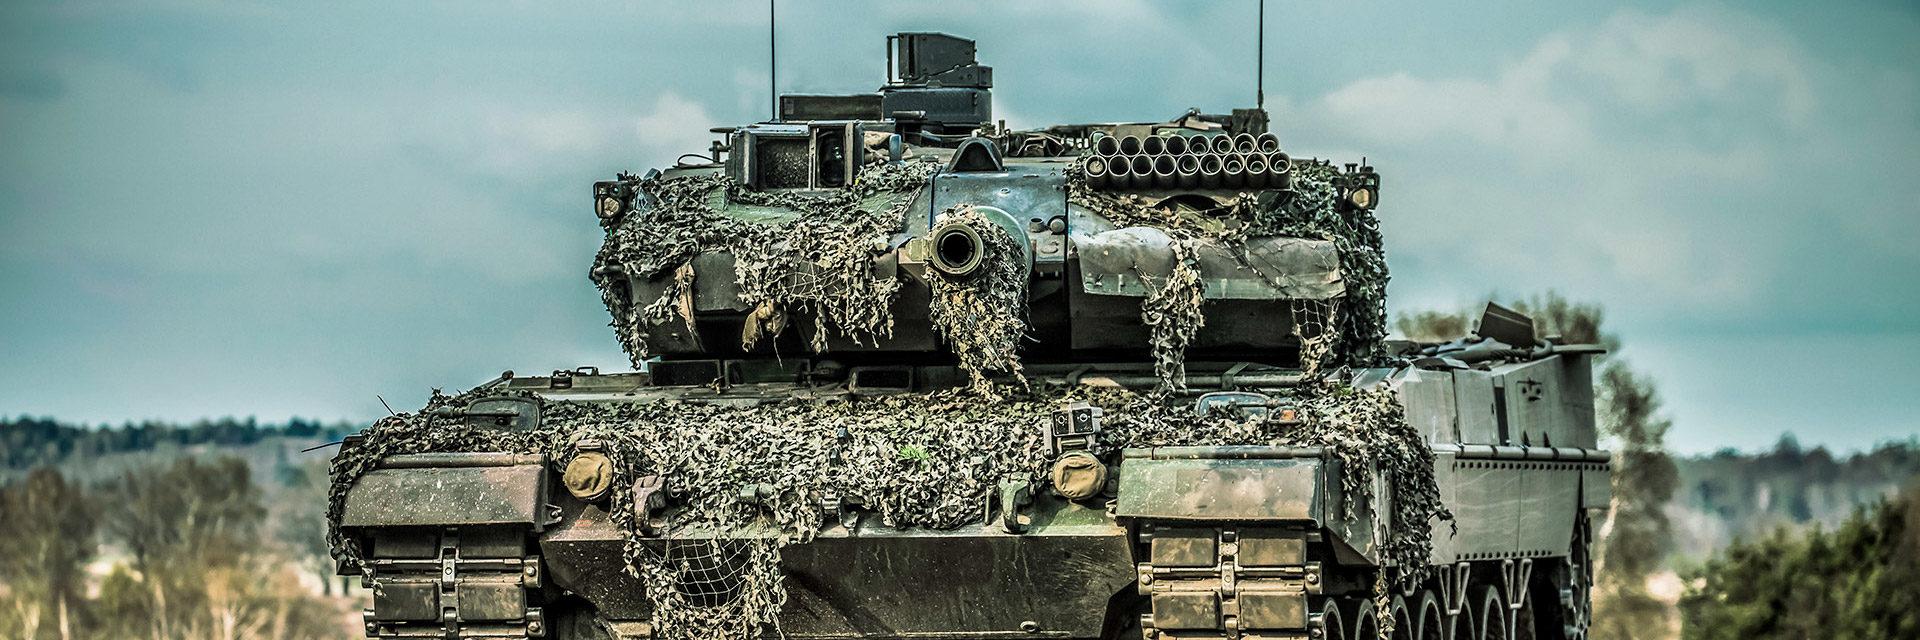 Czołg Leopard 2A6